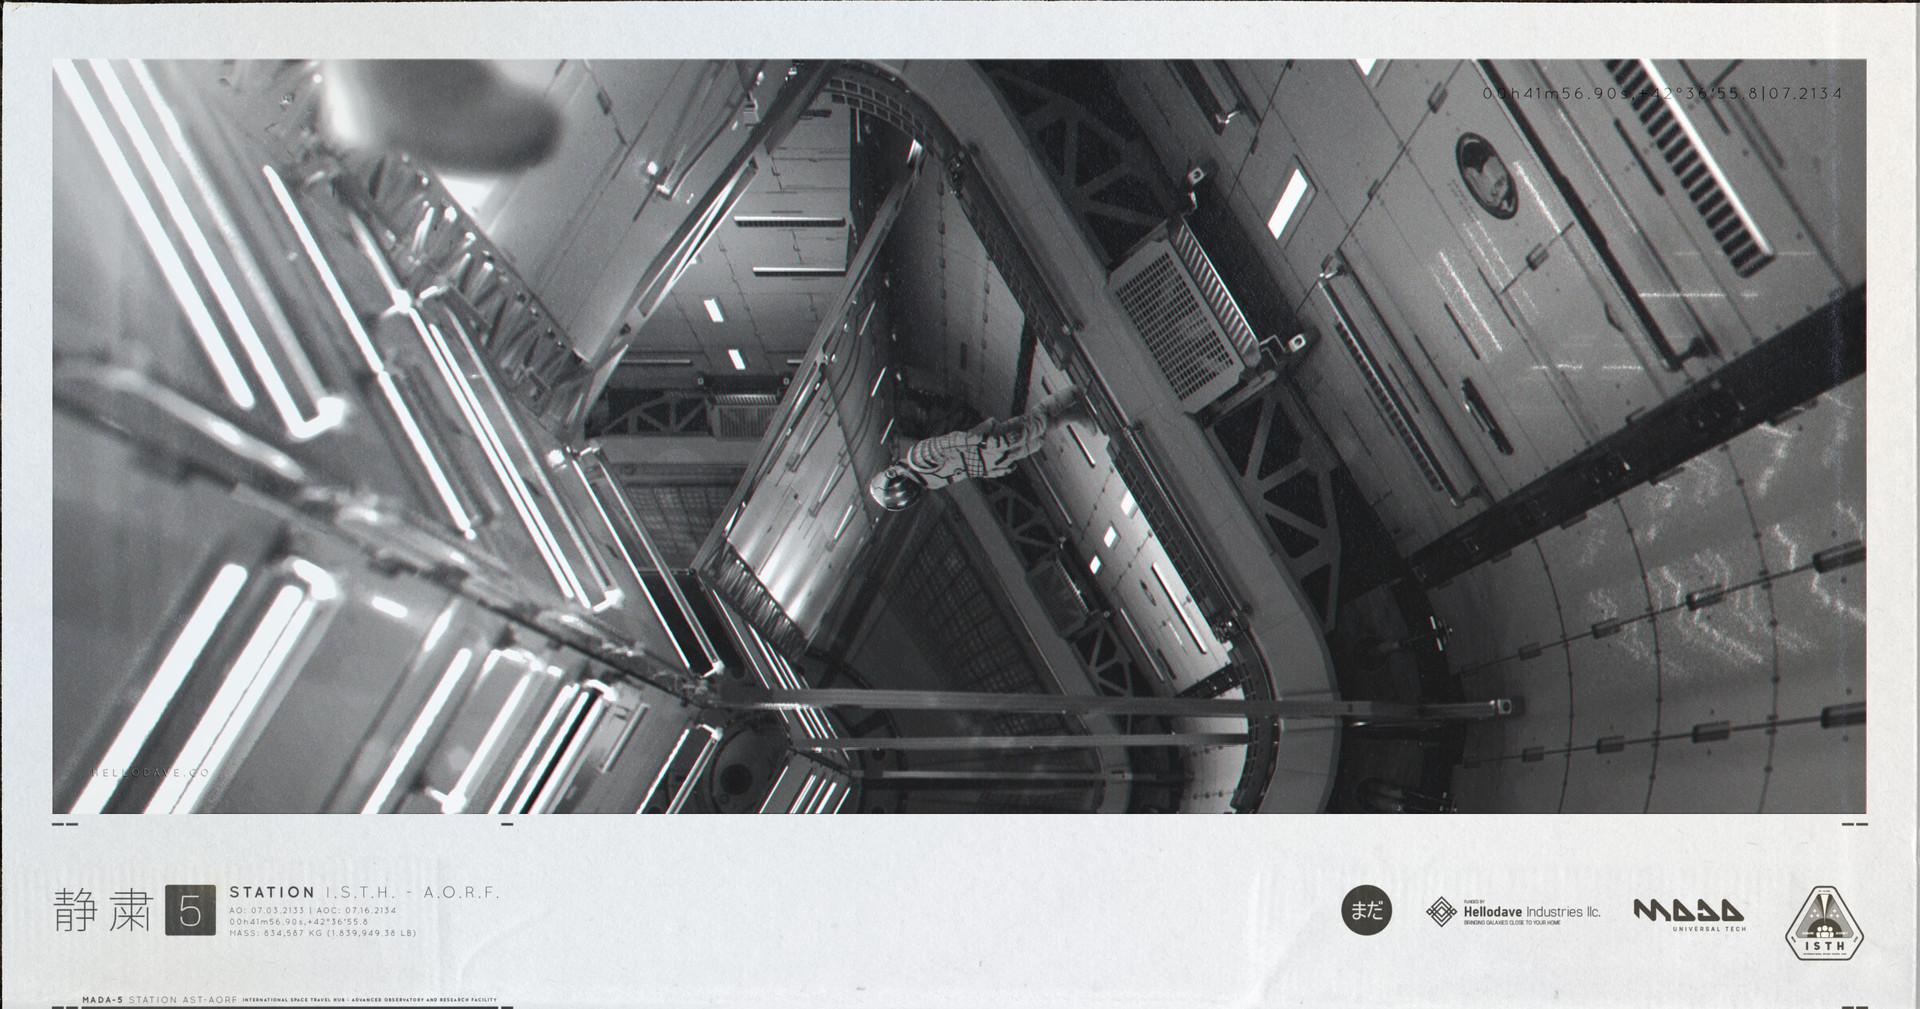 Davison carvalho station horizontal mon 05a